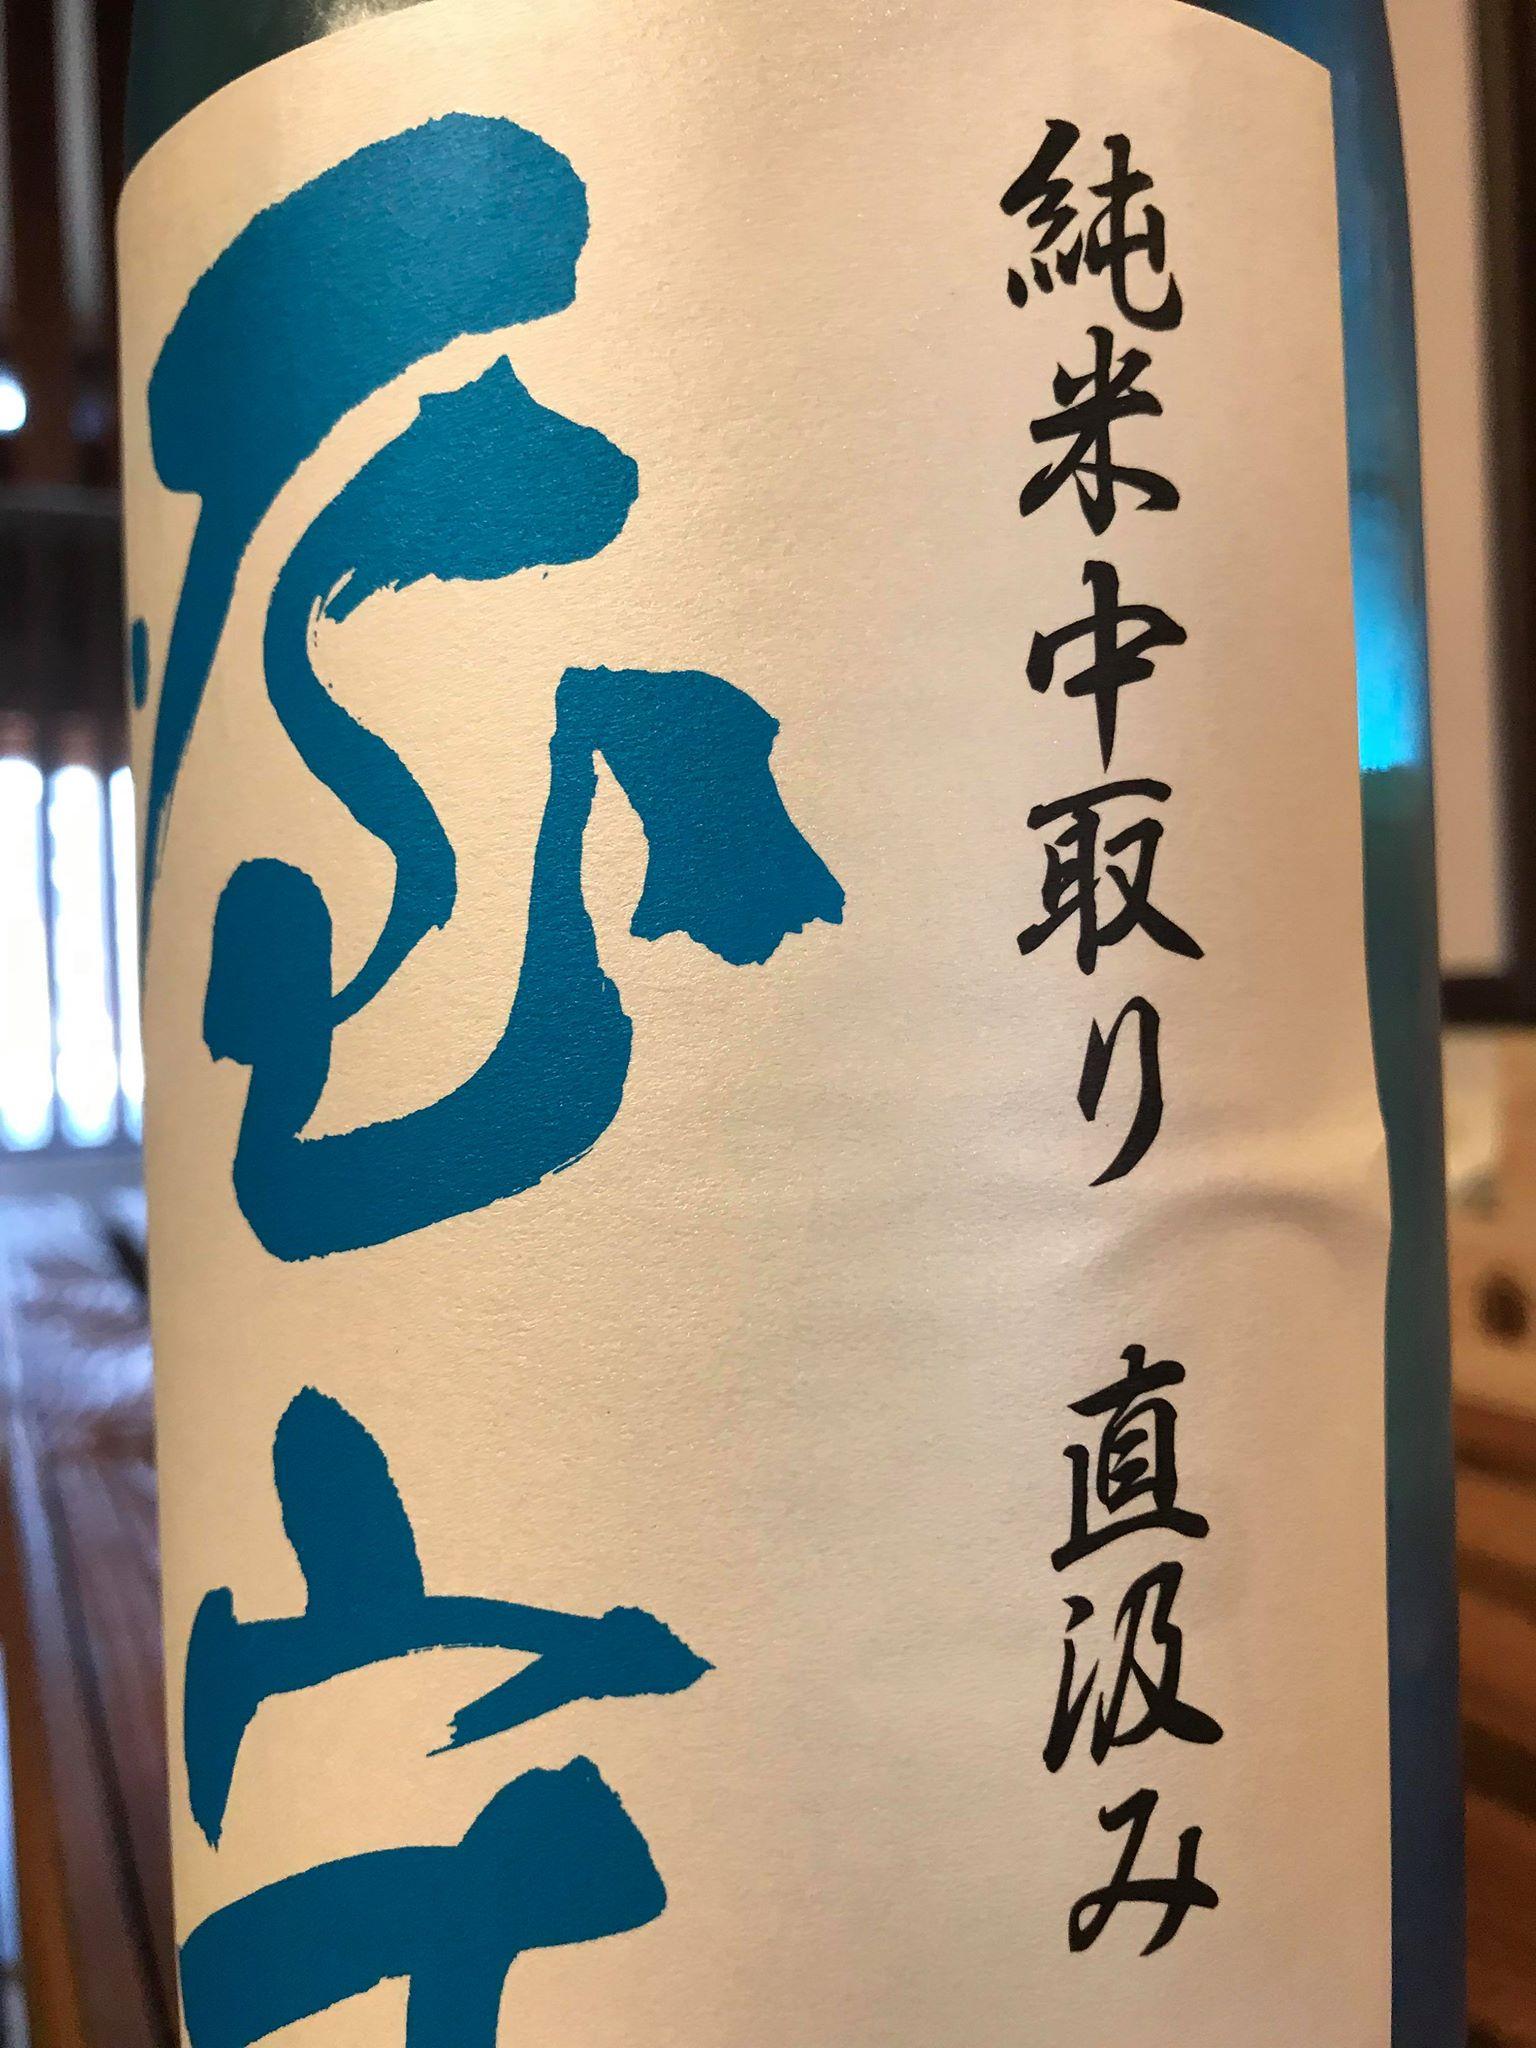 【日本酒】屋守 直汲み 純米中取り 無調整生酒 八反錦 夏色ヤモリ 限定 29BY_e0173738_20343895.jpg